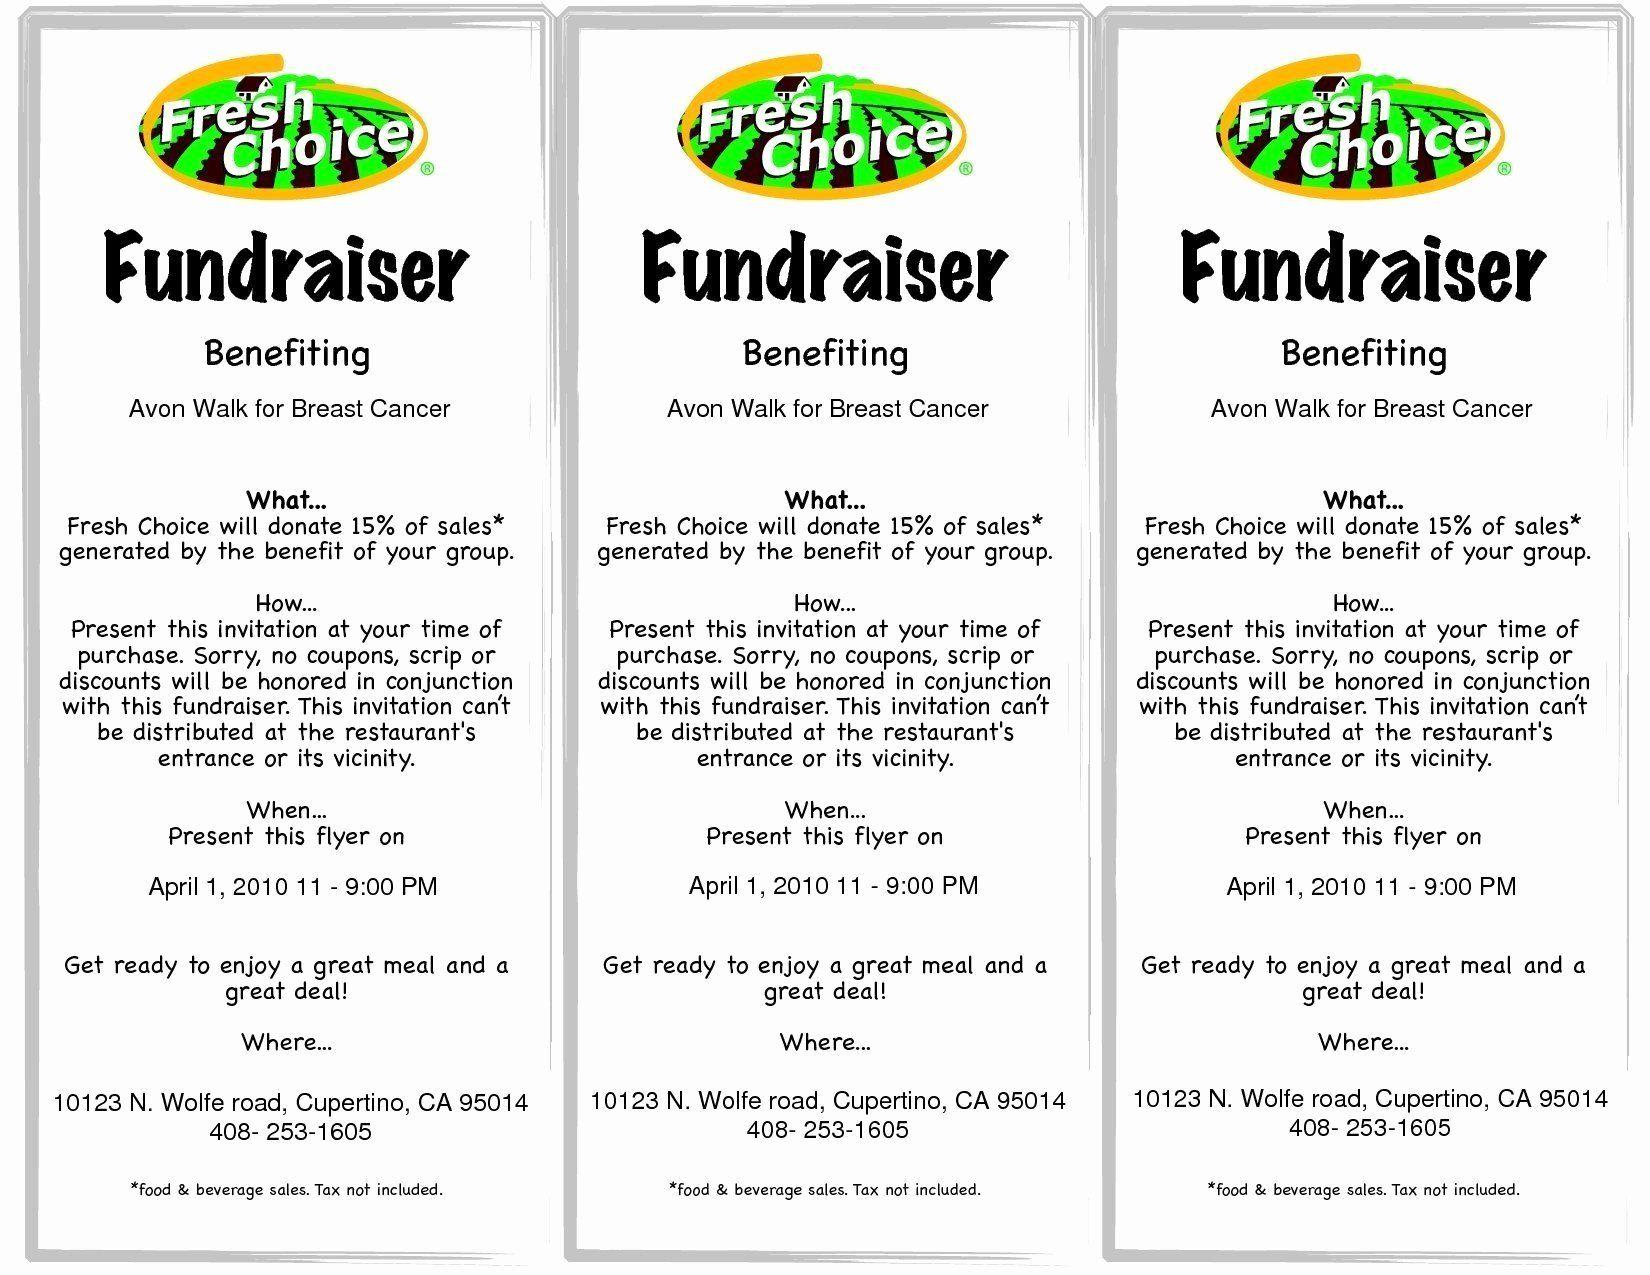 Cancer Fundraiser Flyer Template Beautiful Cancer Fundraiser Flyer Template Yourweek Beca25e Fundraiser Flyer Free Fundraisers Flyer Template